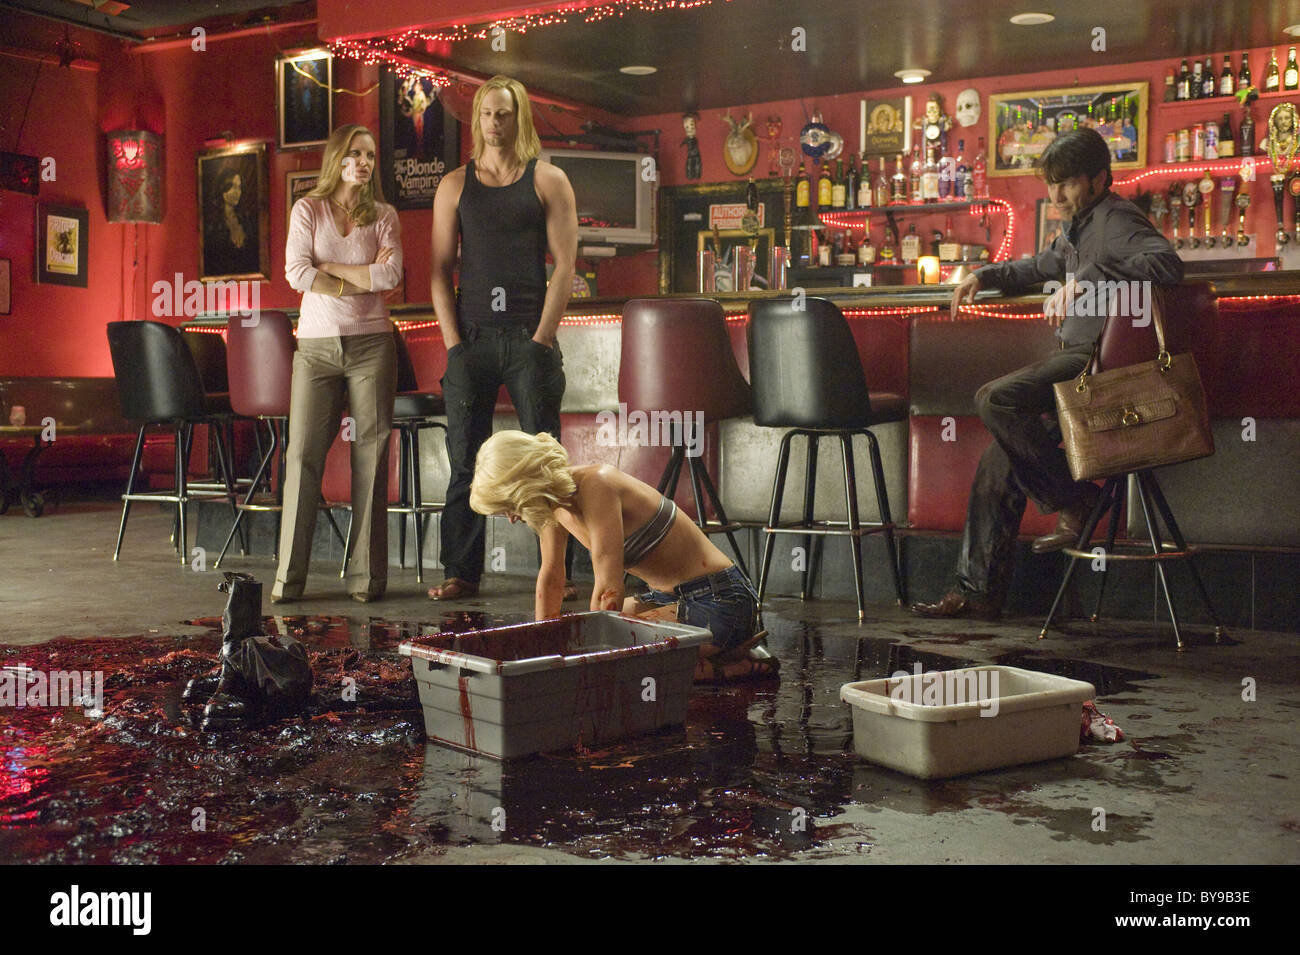 True Blood TV Series 2008 - ???? USA 2008 Season 01 - Episode 09 Plaisir d'amour Director Anthony Hemingway - Stock Image